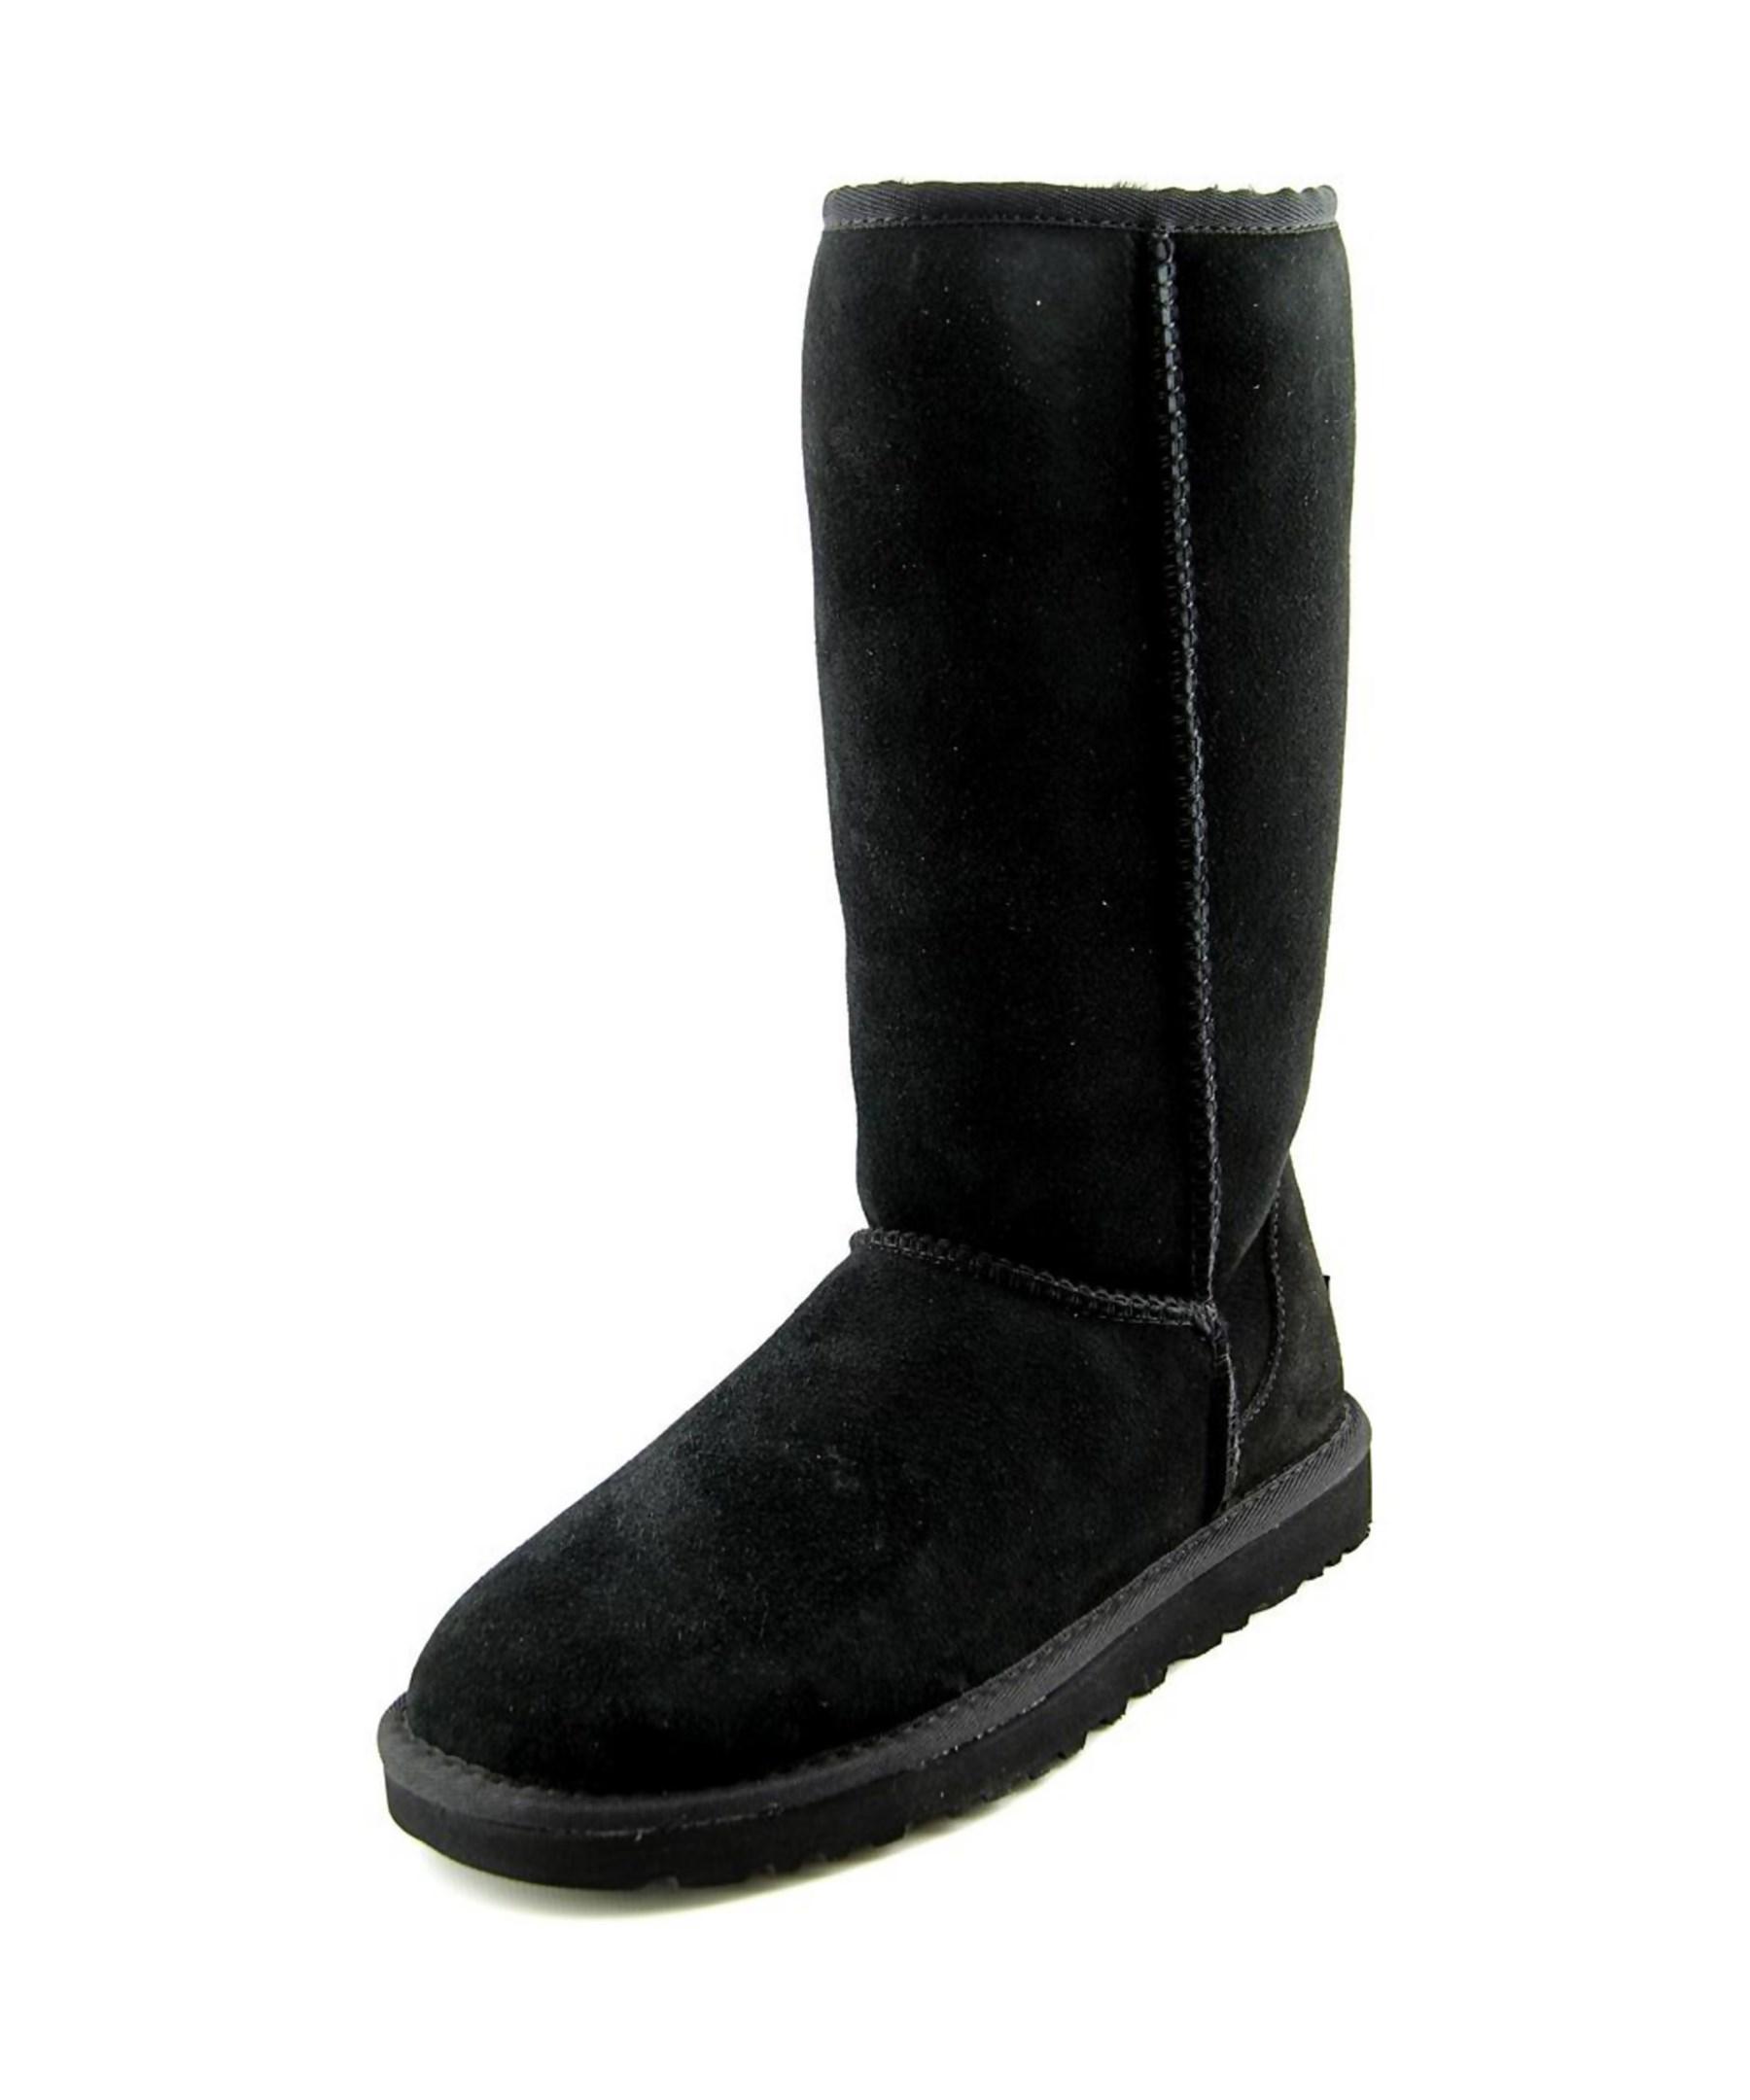 01c13bd6e09 Womens Classic Tall Ugg Boots Black - cheap watches mgc-gas.com